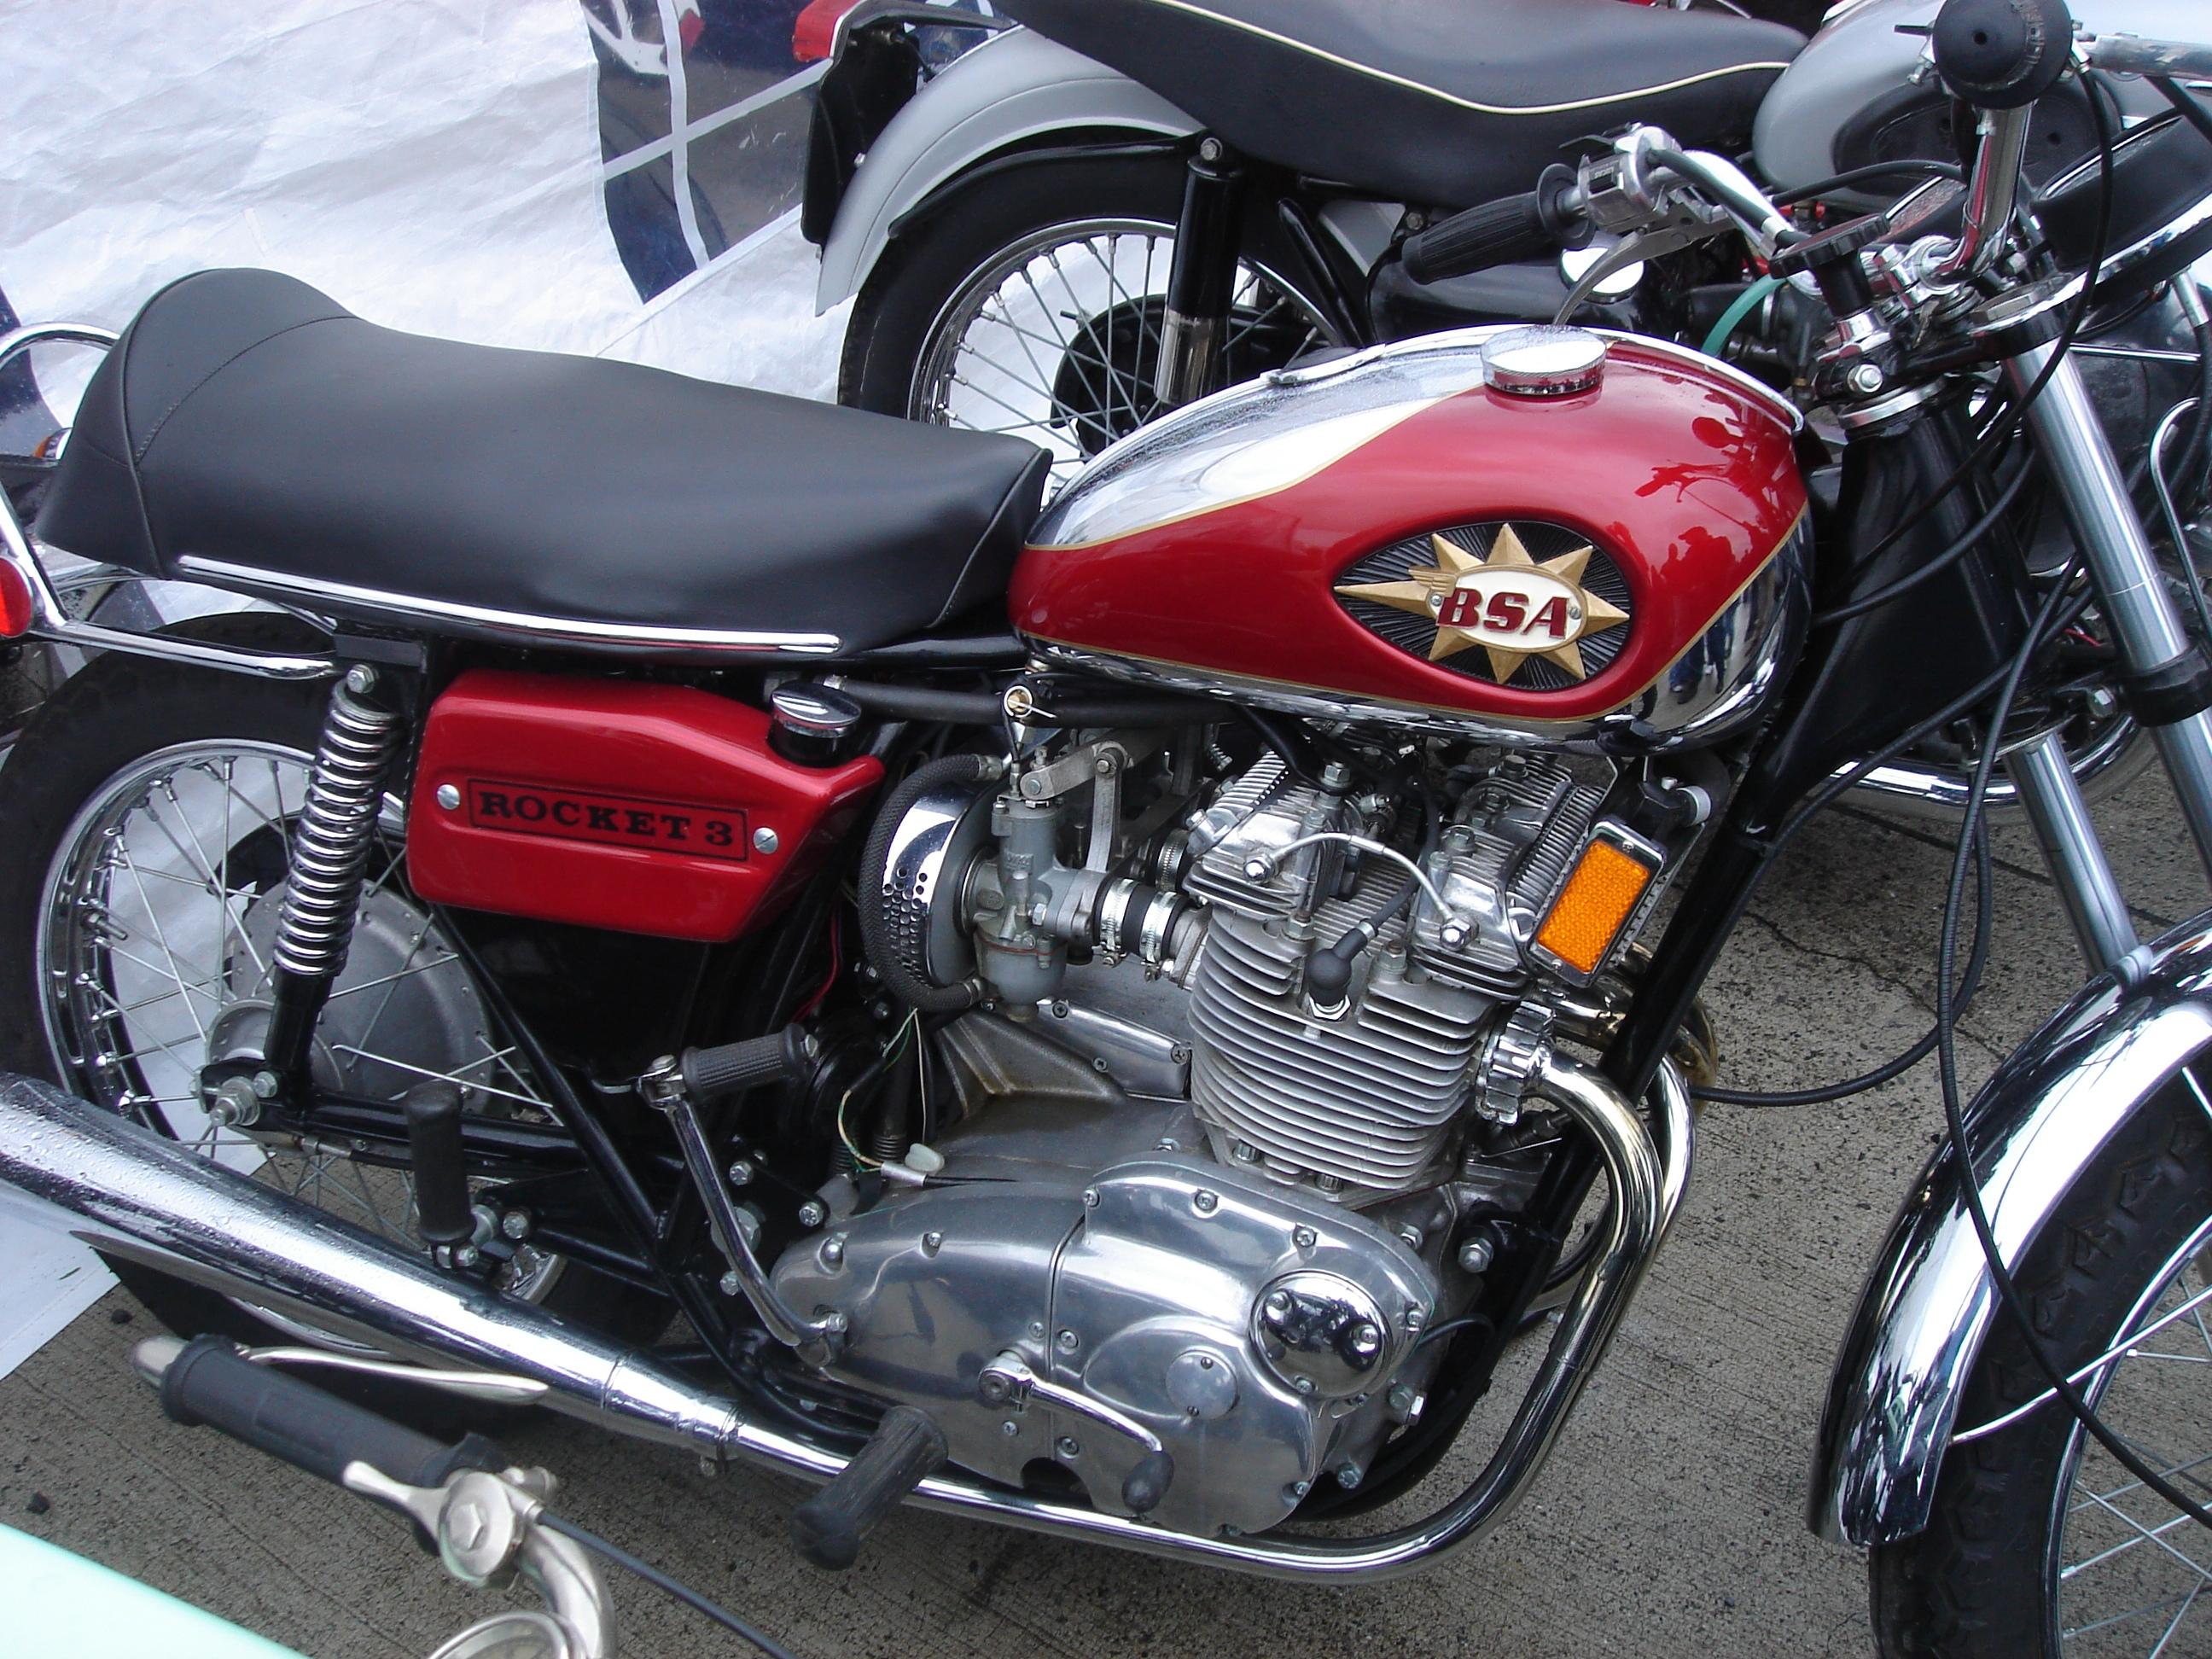 Honda Motorcycle Dealer Manila Philippines